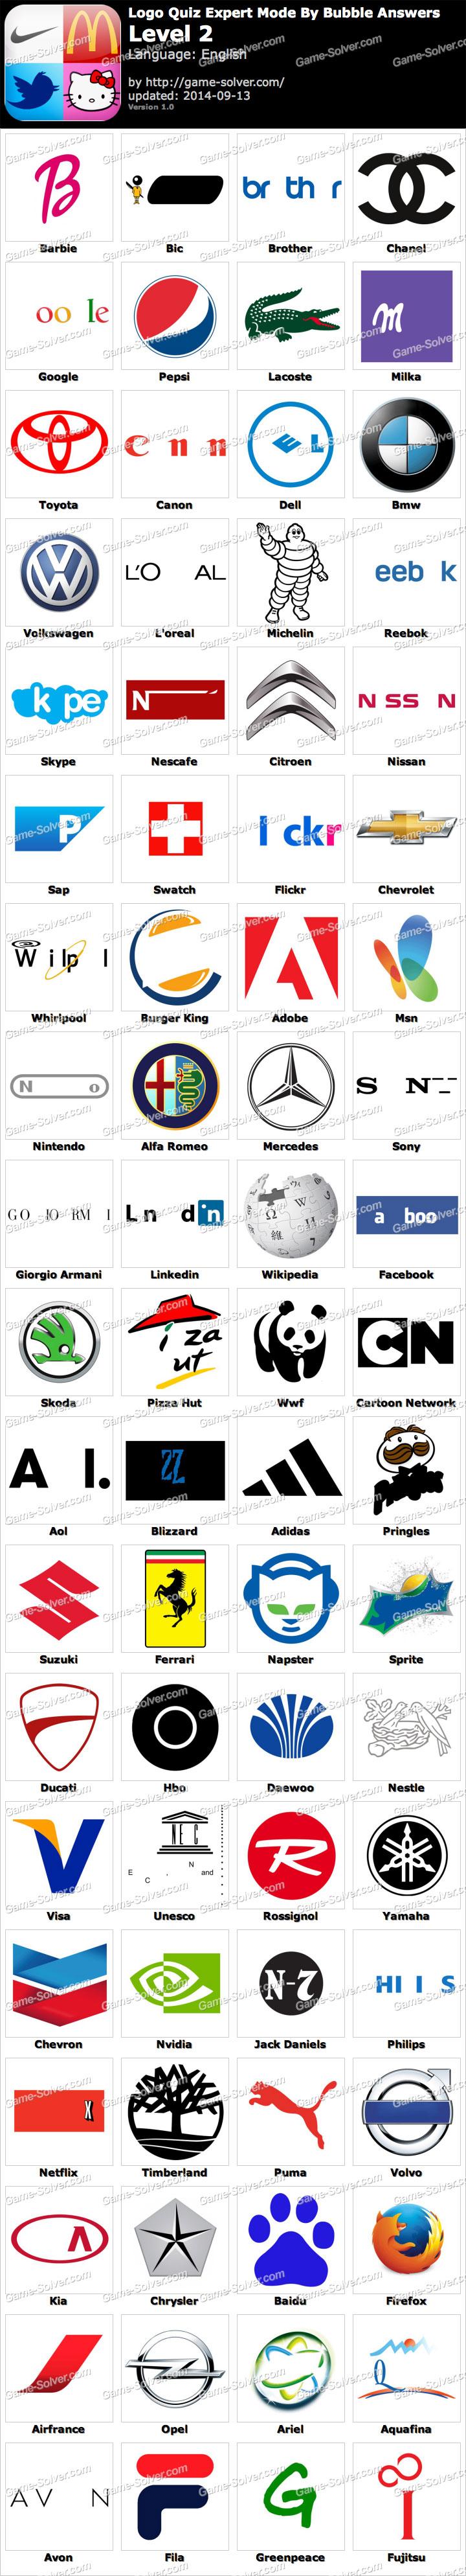 Logo Quiz Expert Mode Bubble